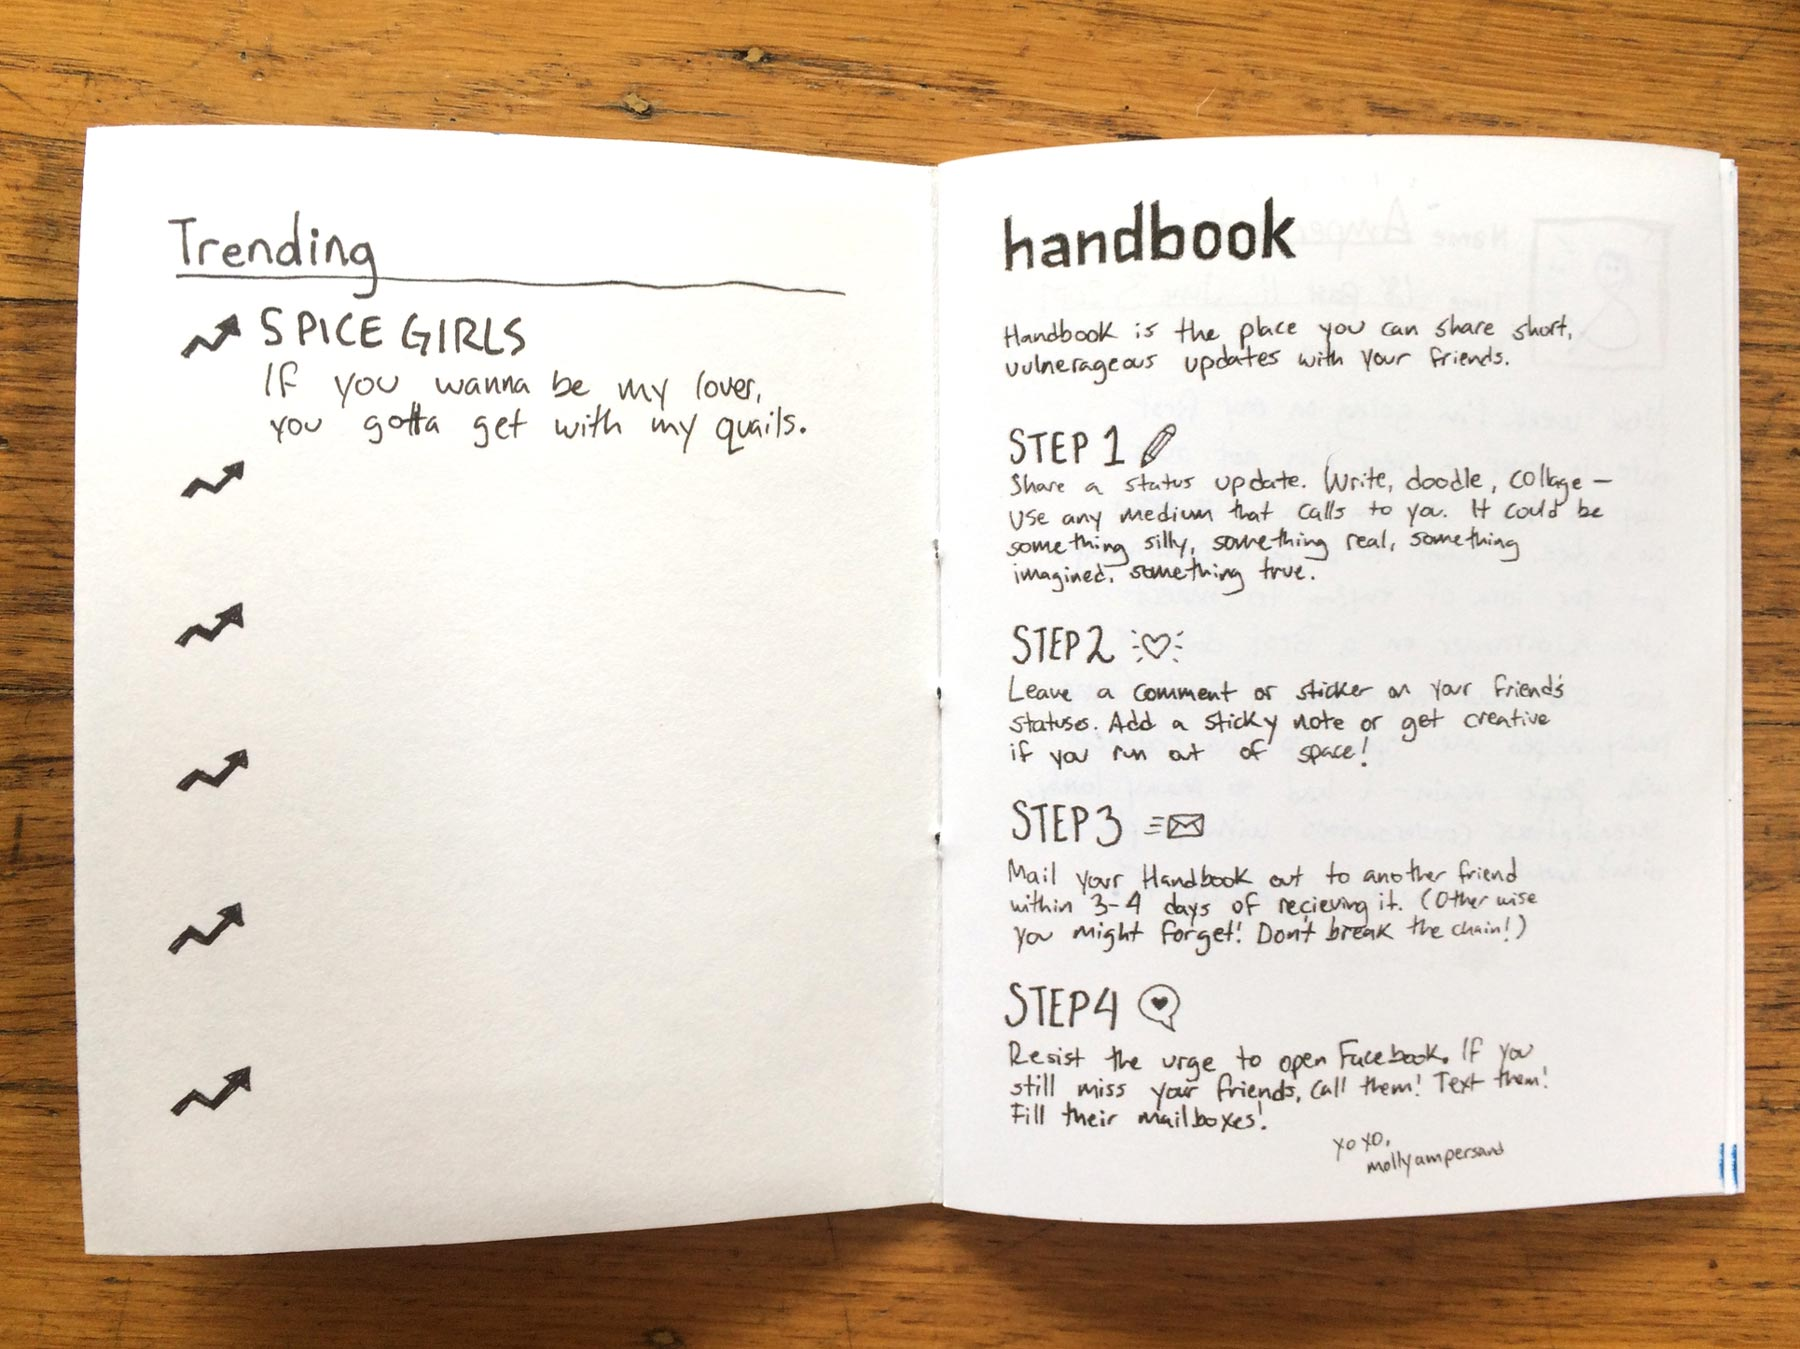 handbook-intro.jpg